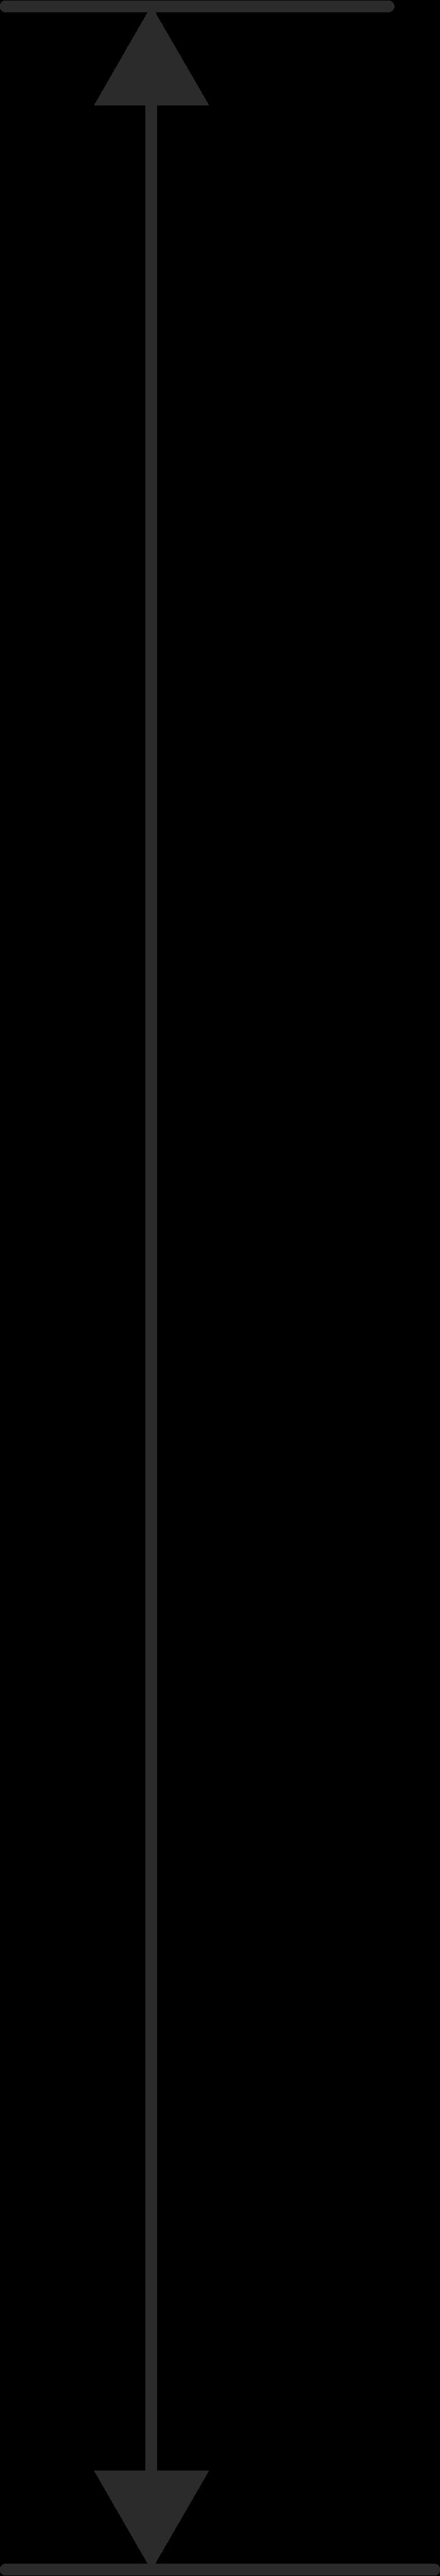 vertical arrow Clipart illustration in PNG, SVG